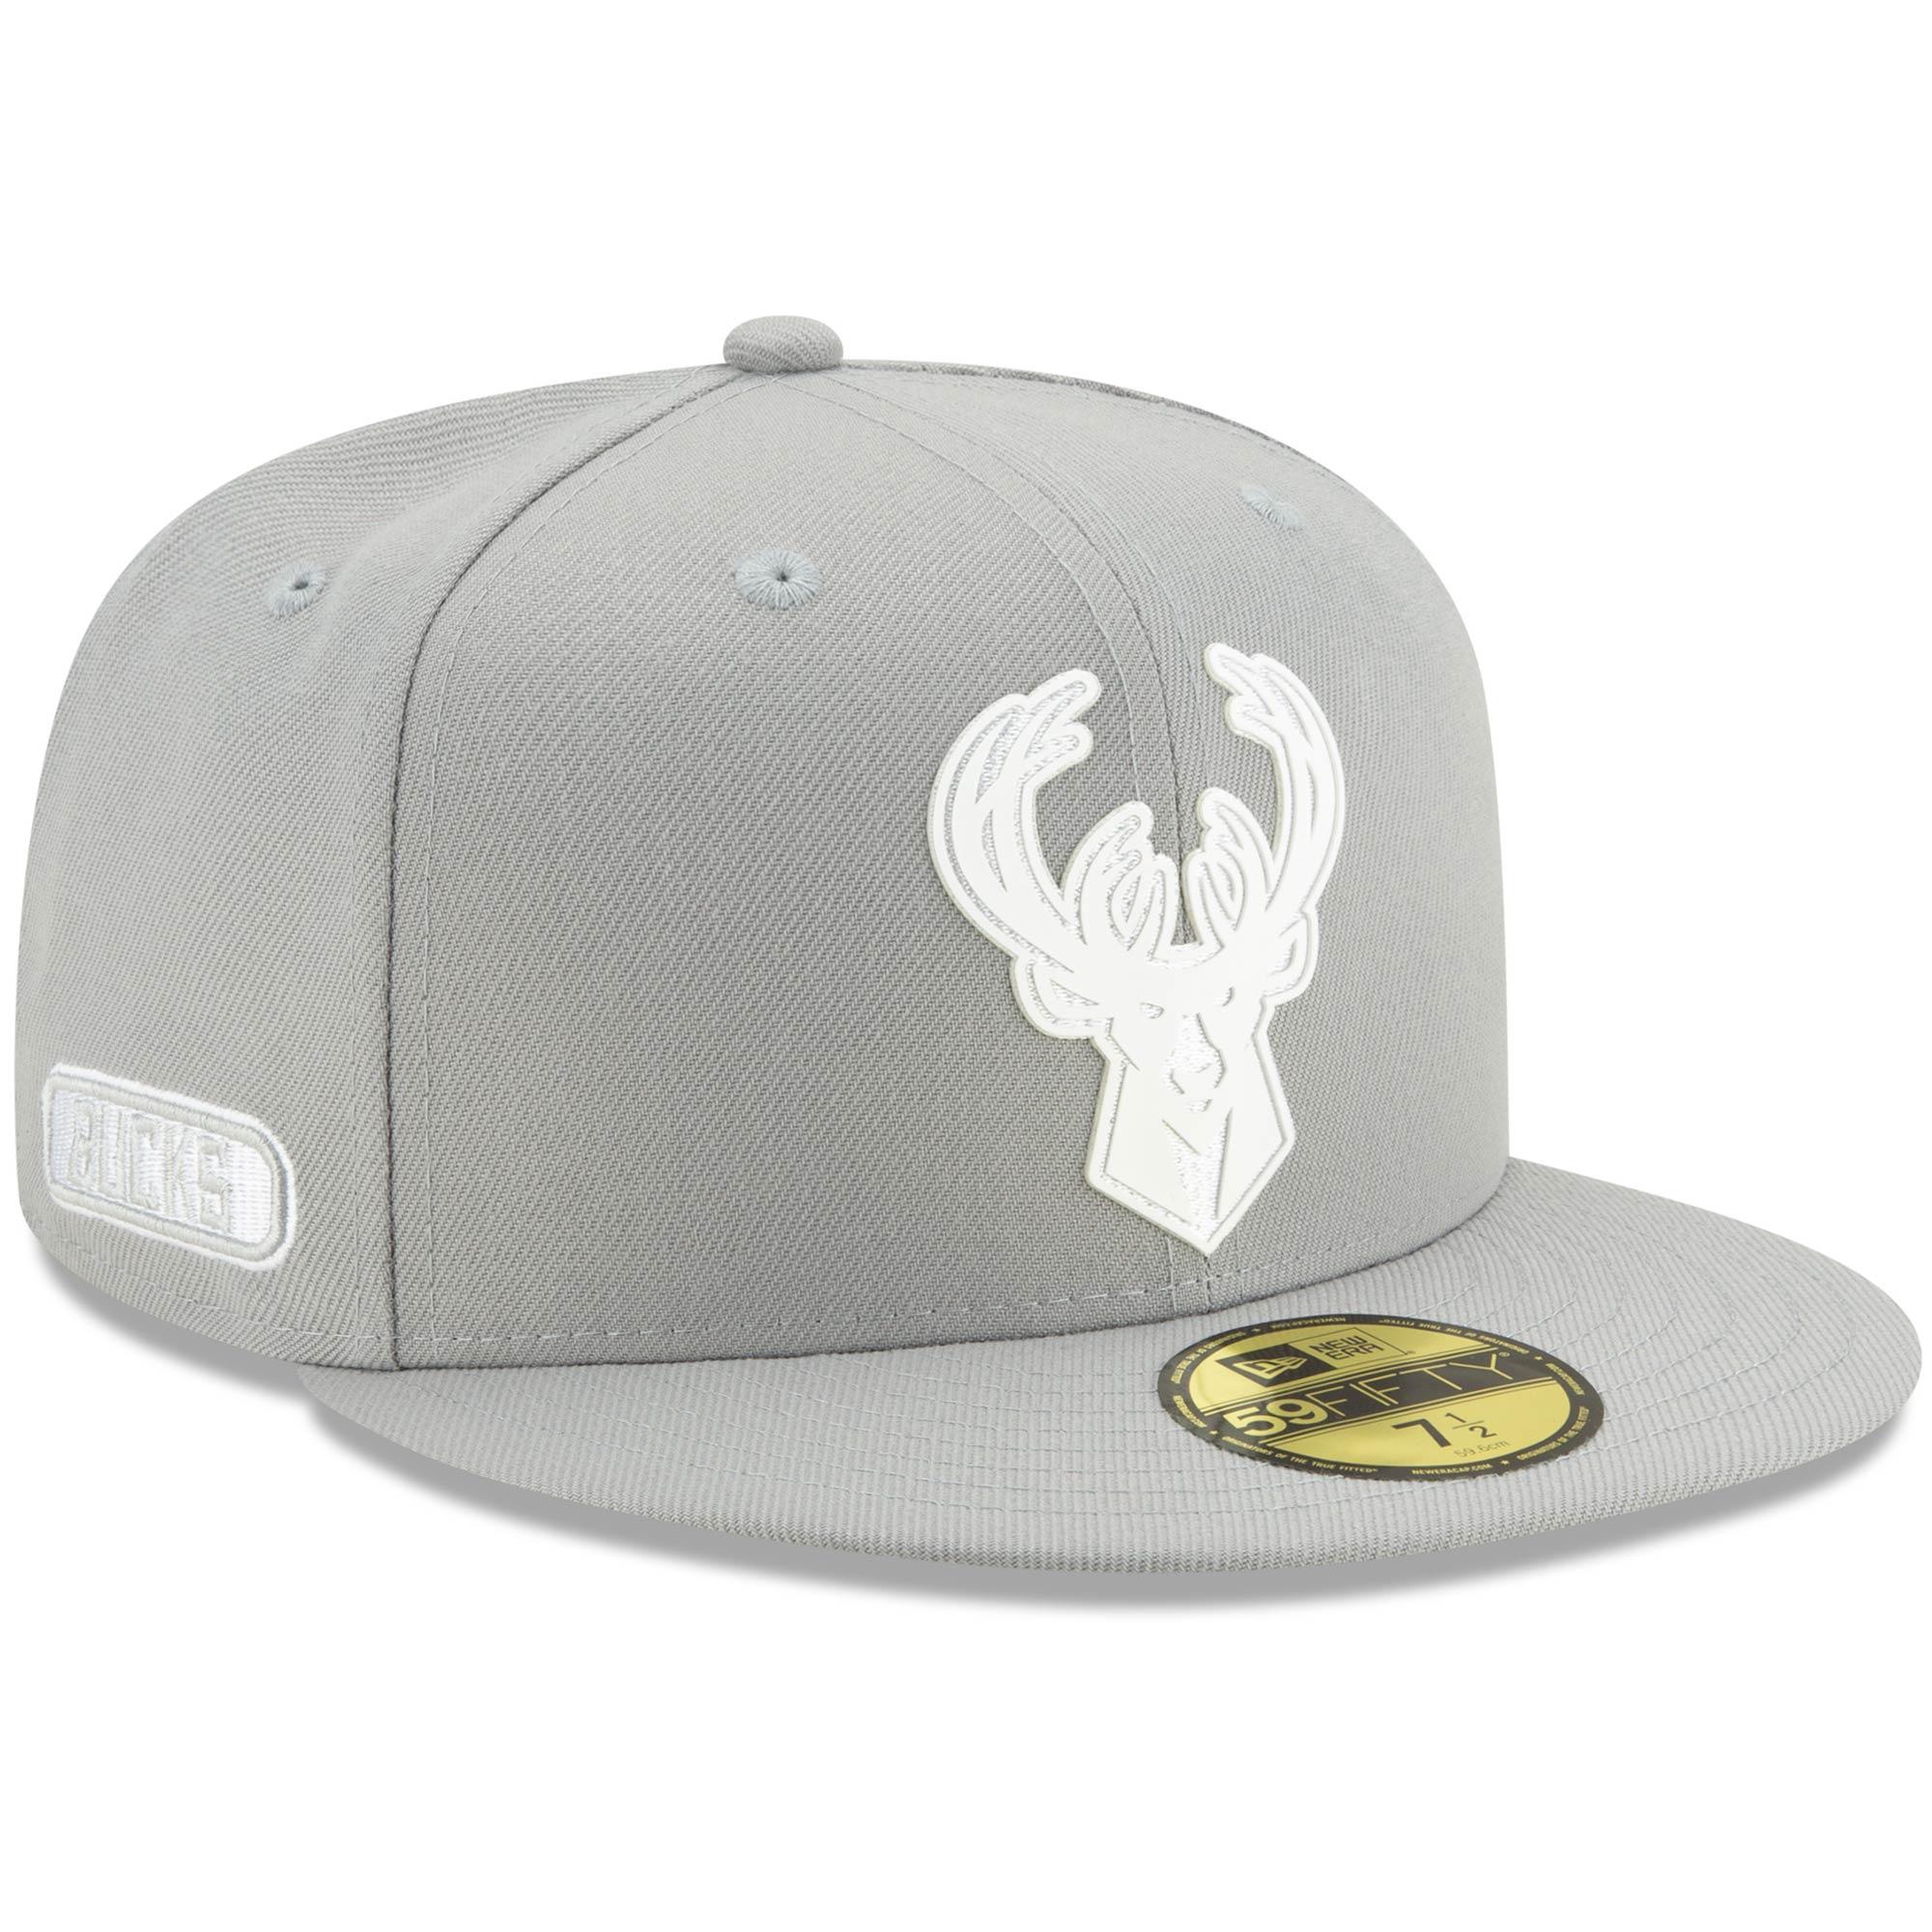 Milwaukee Bucks New Era Back Half 59FIFTY Fitted Hat - Gray